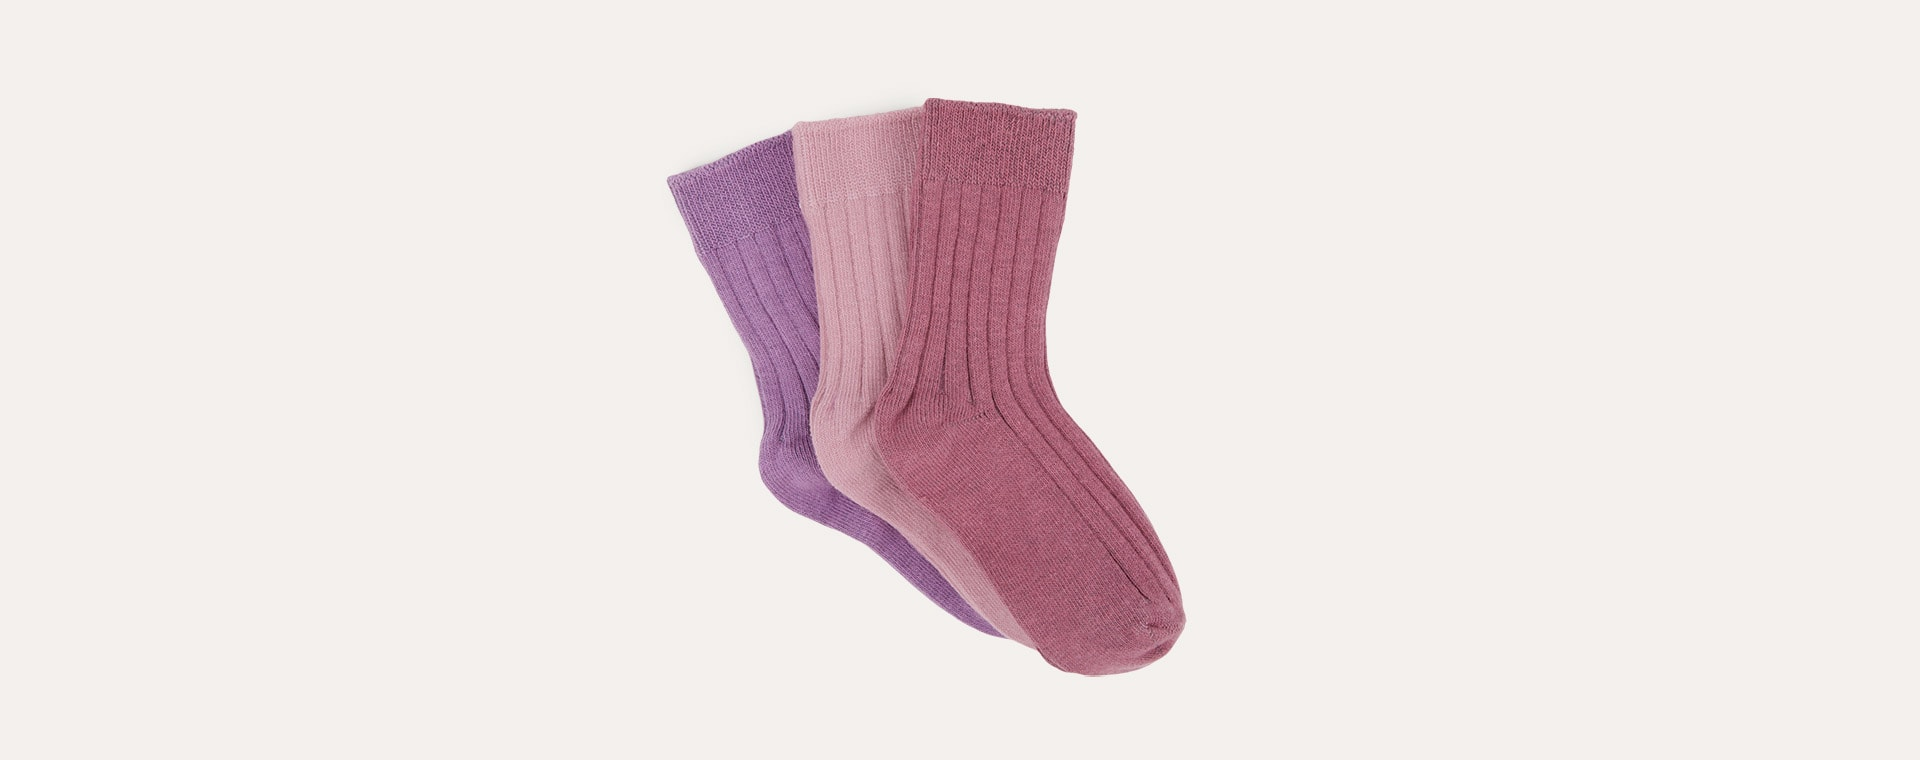 Heather Mix KIDLY Label 3-Pack Socks